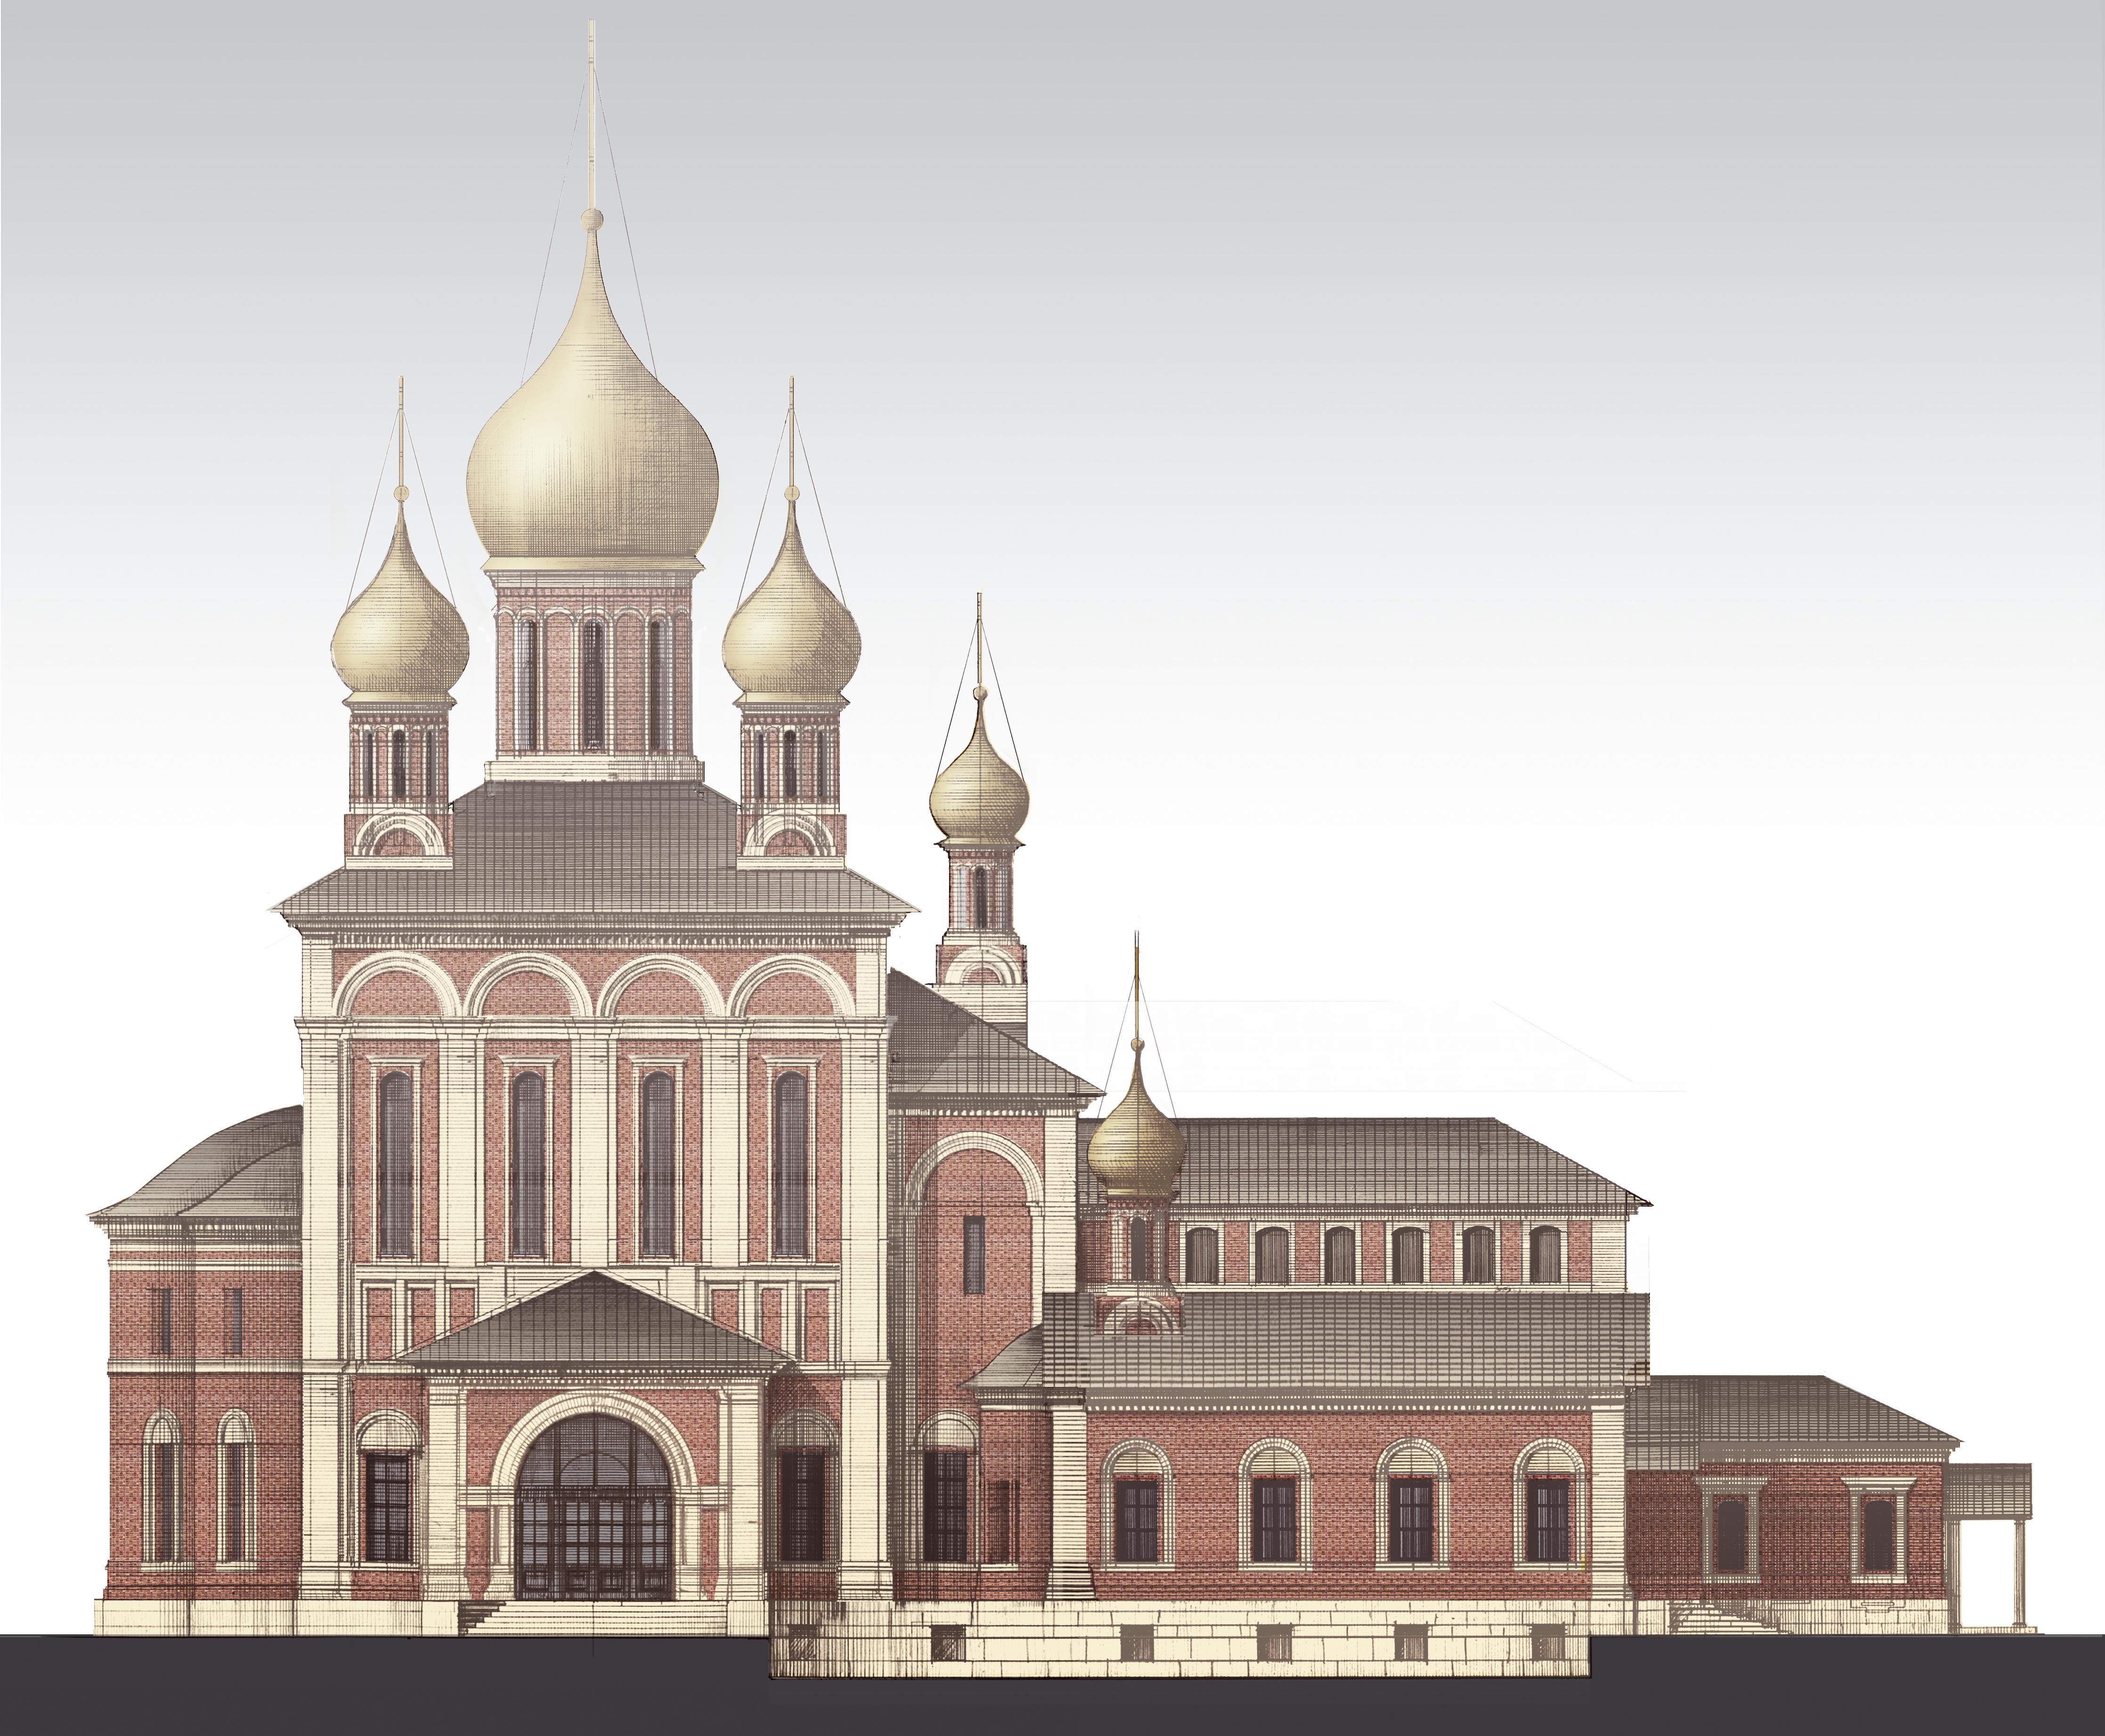 РОЖДЕСТВЕНСКИЙ СОБОР, фасад, вар.2